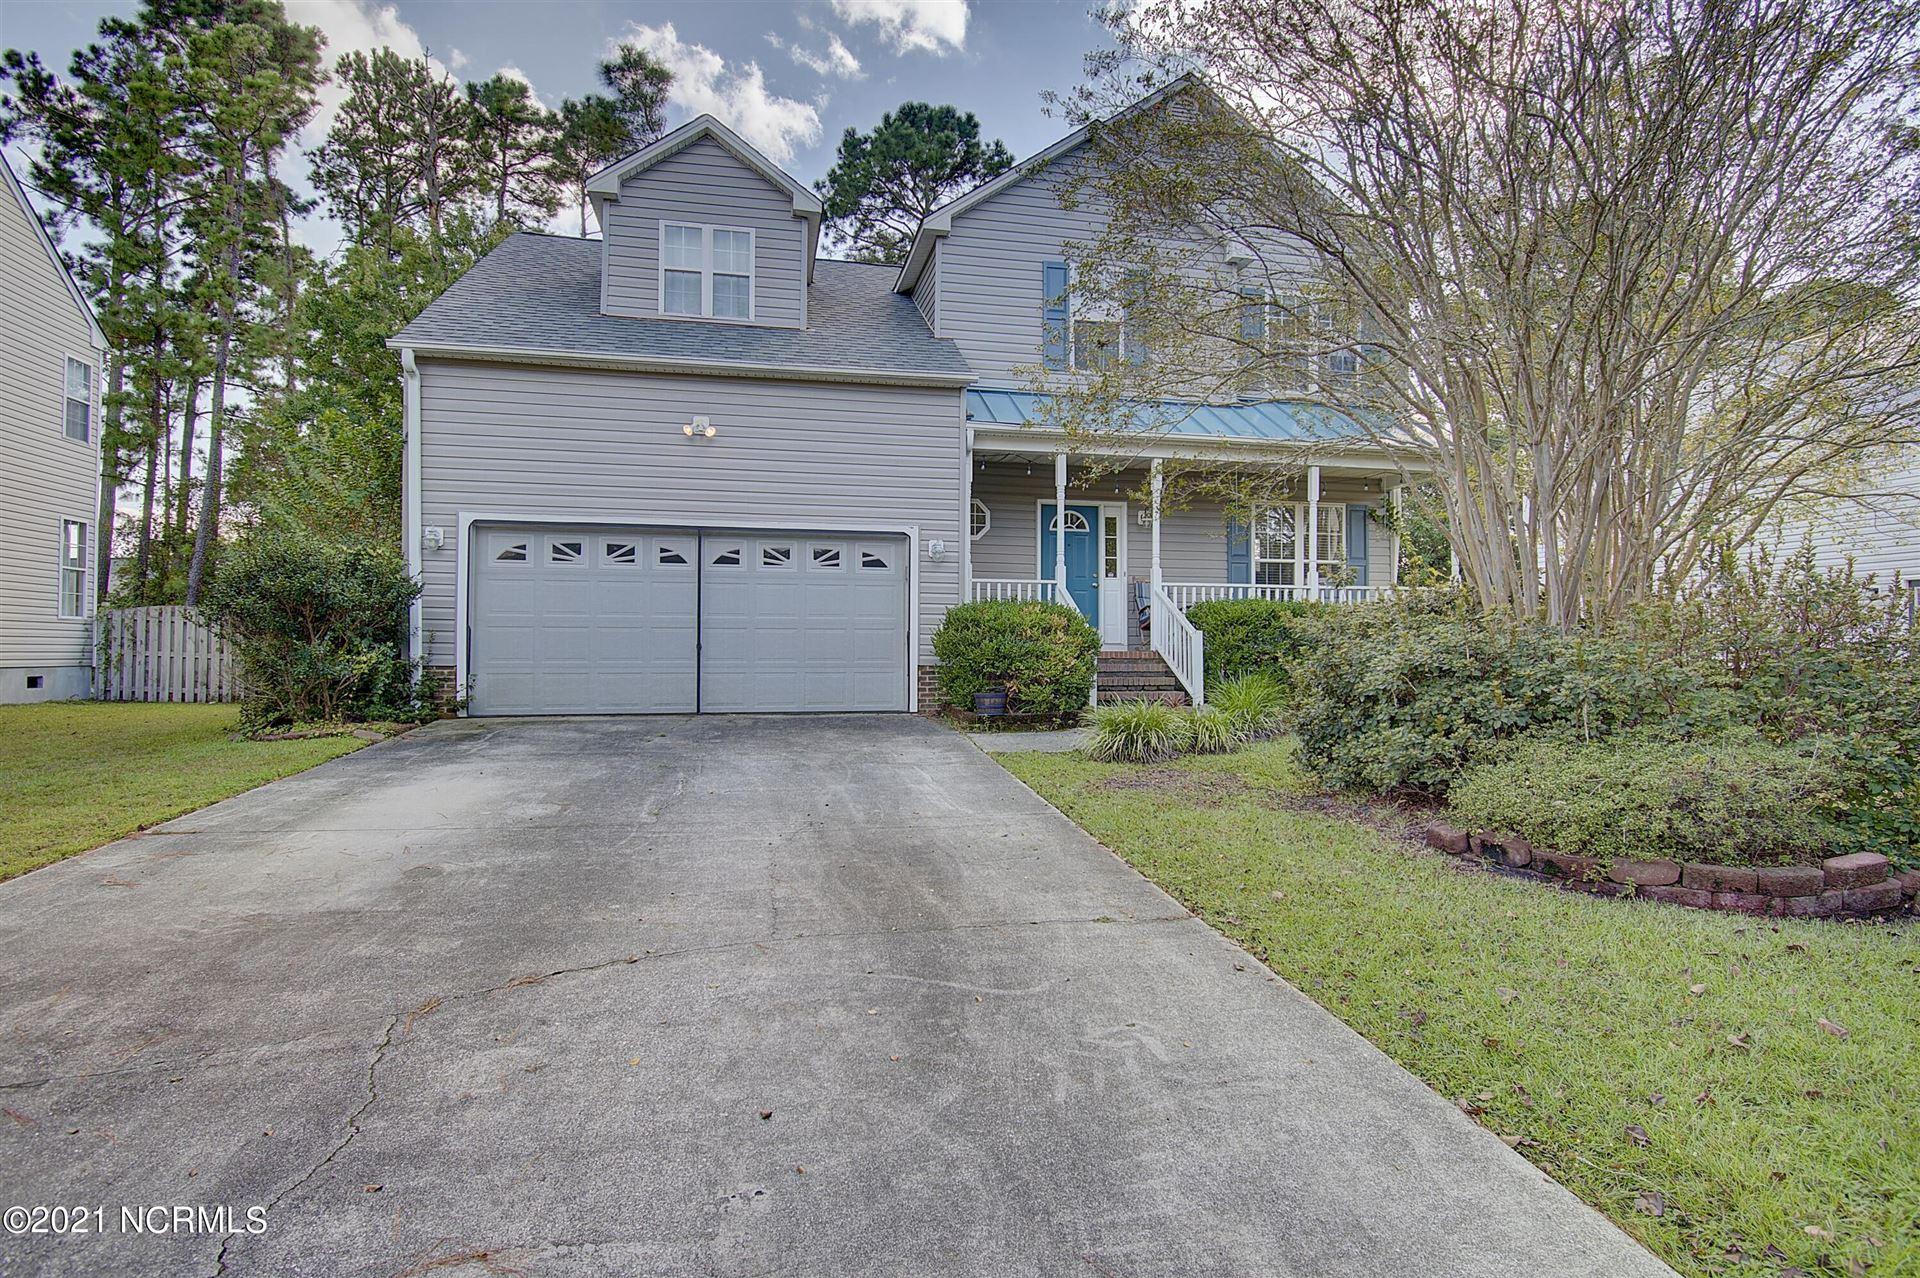 Photo of 4814 Woods Edge Road, Wilmington, NC 28409 (MLS # 100292001)